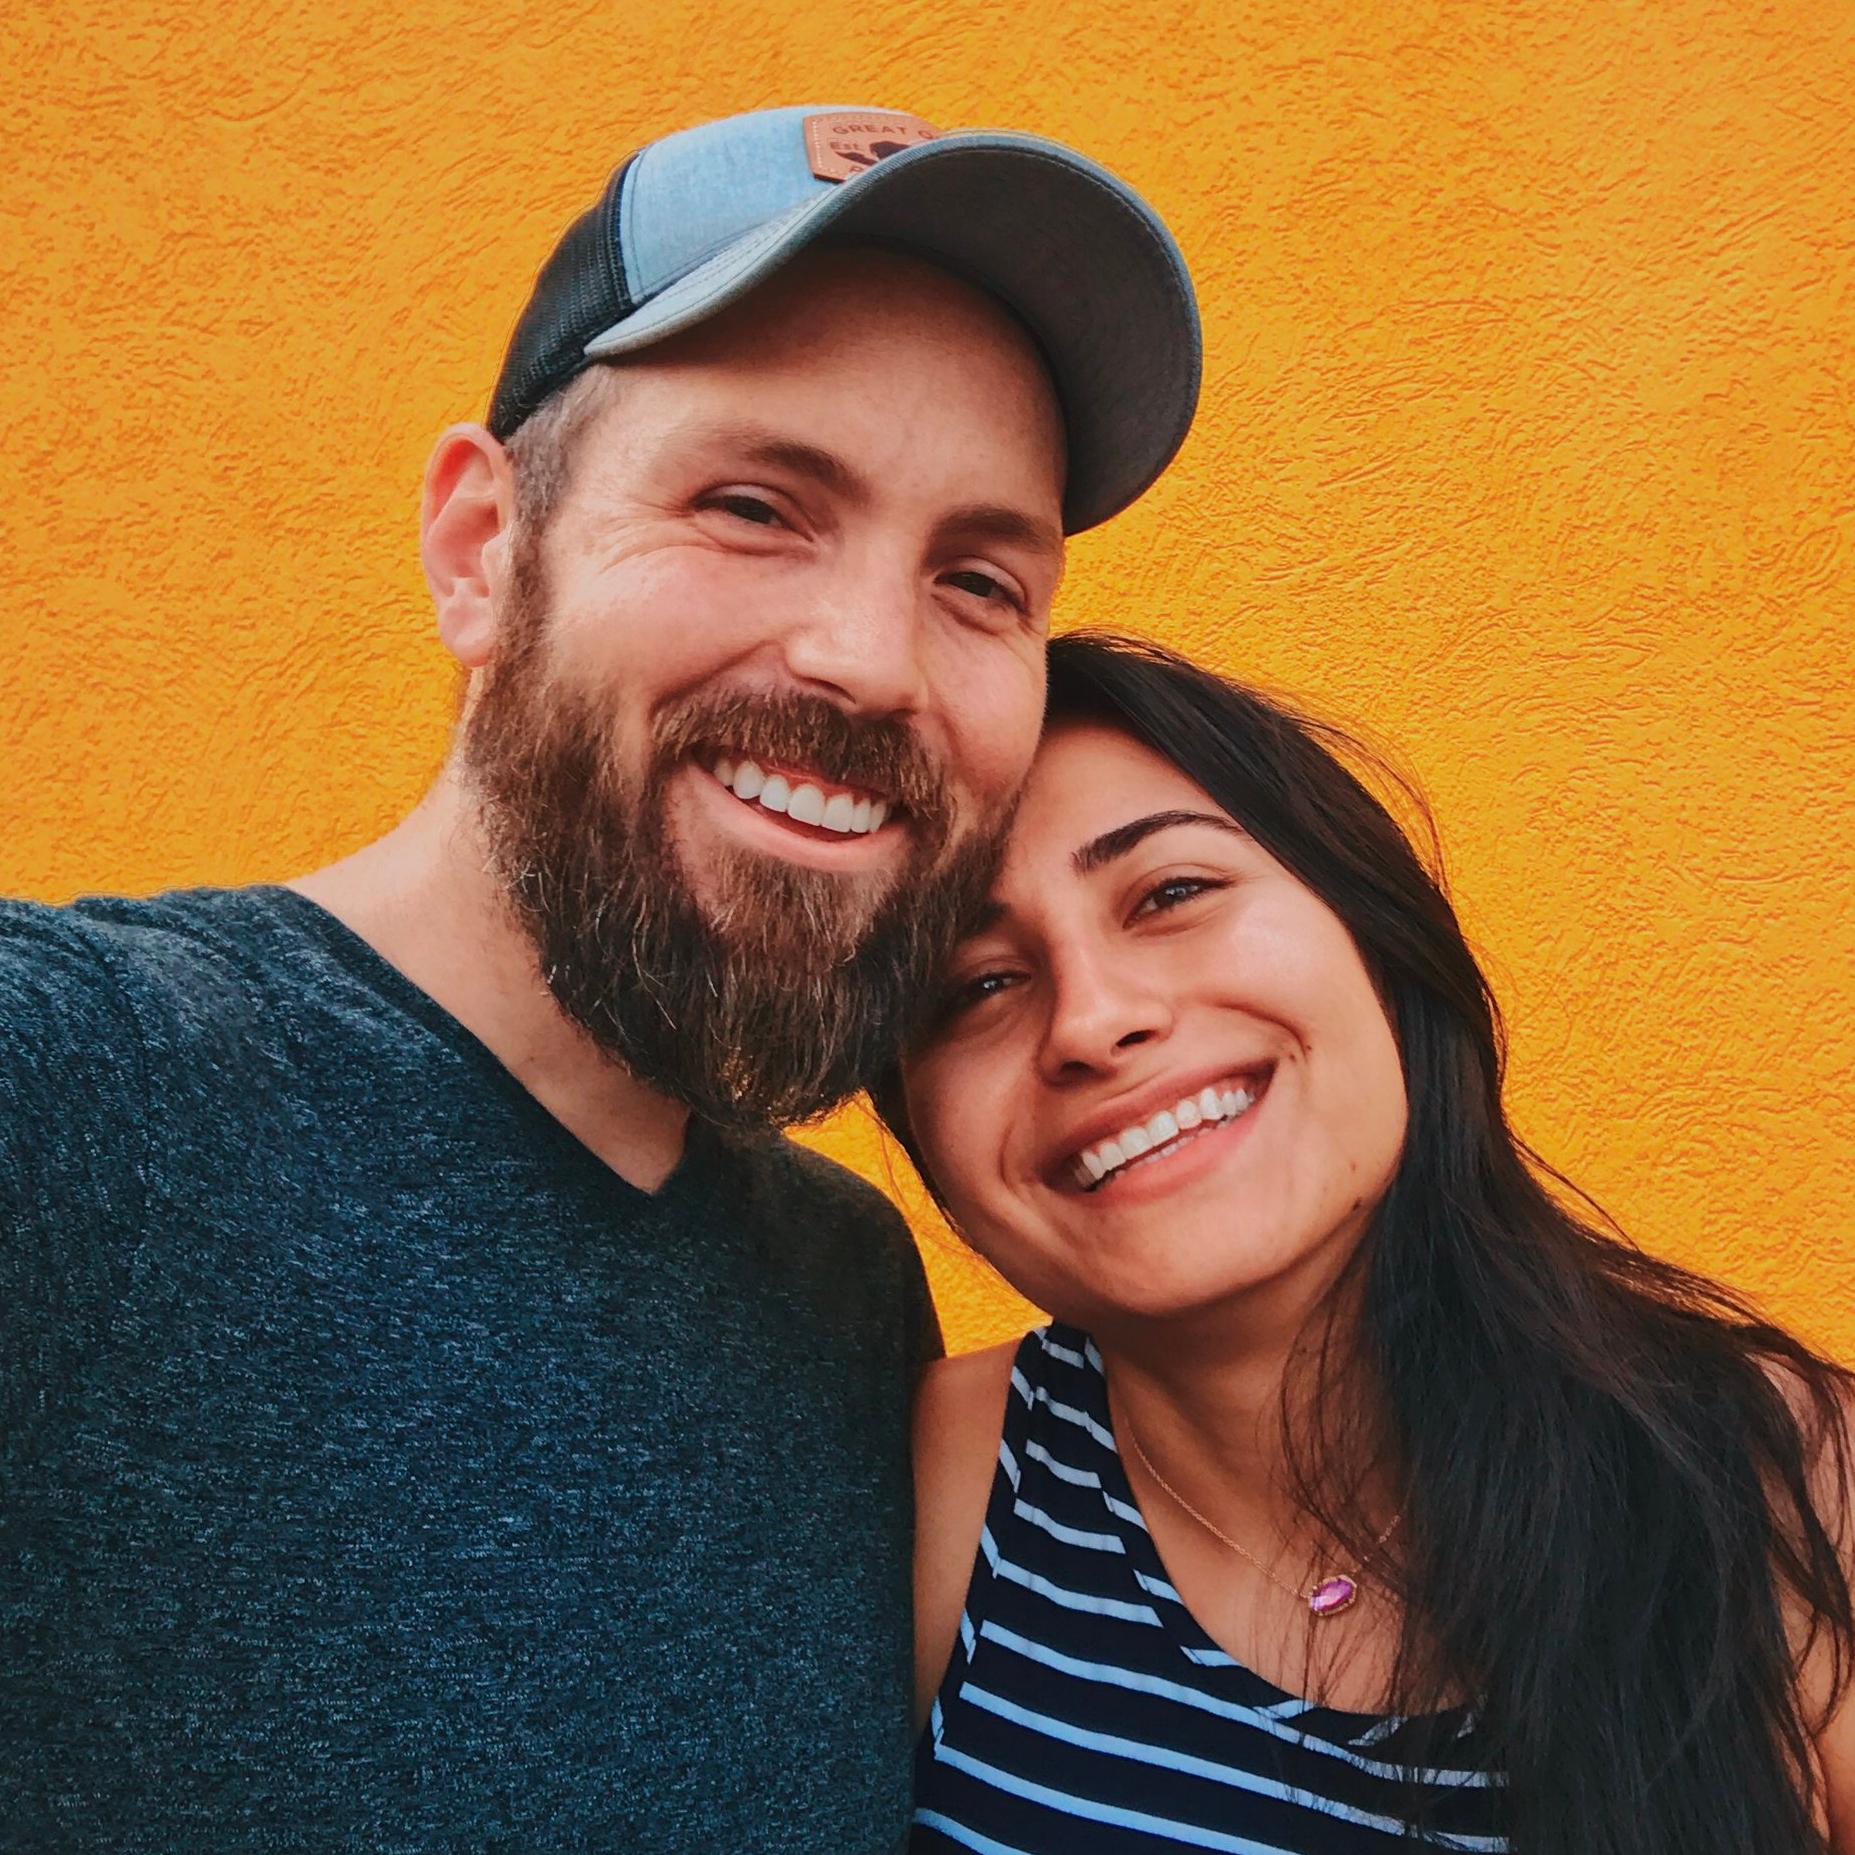 ZACH + CAROLINA - A Husband and Wife Team